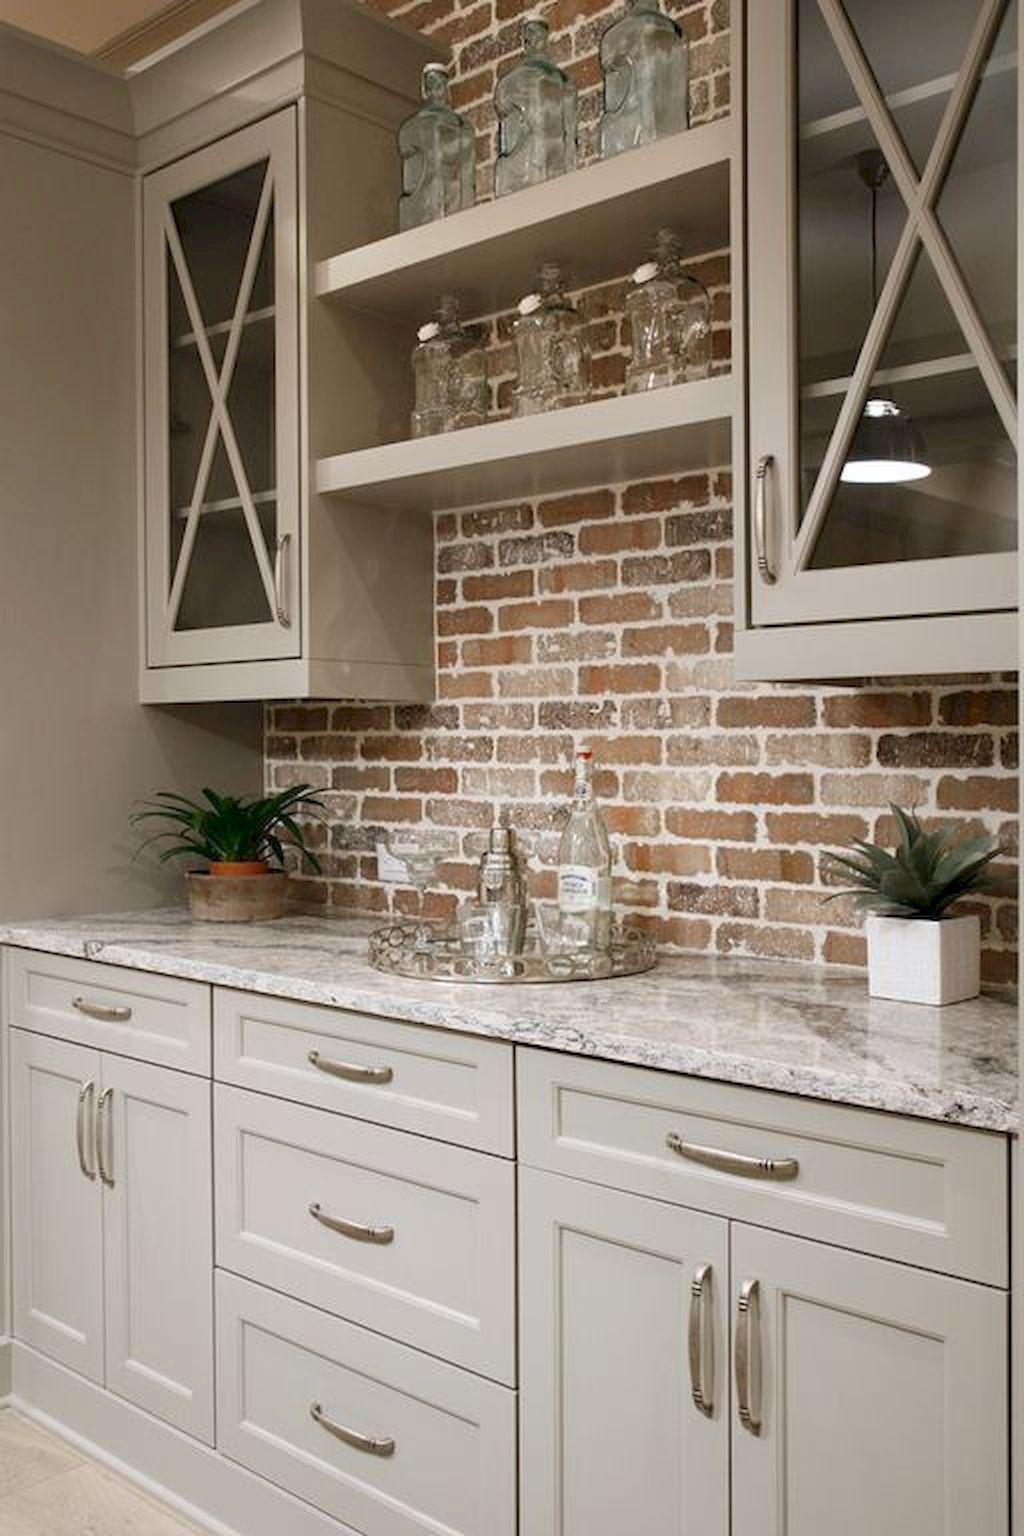 10 Rustic Kitchen Backsplash Ideas Gallery In 2020 Rustic Kitchen Backsplash Kitchen Remodel Small Farmhouse Kitchen Backsplash